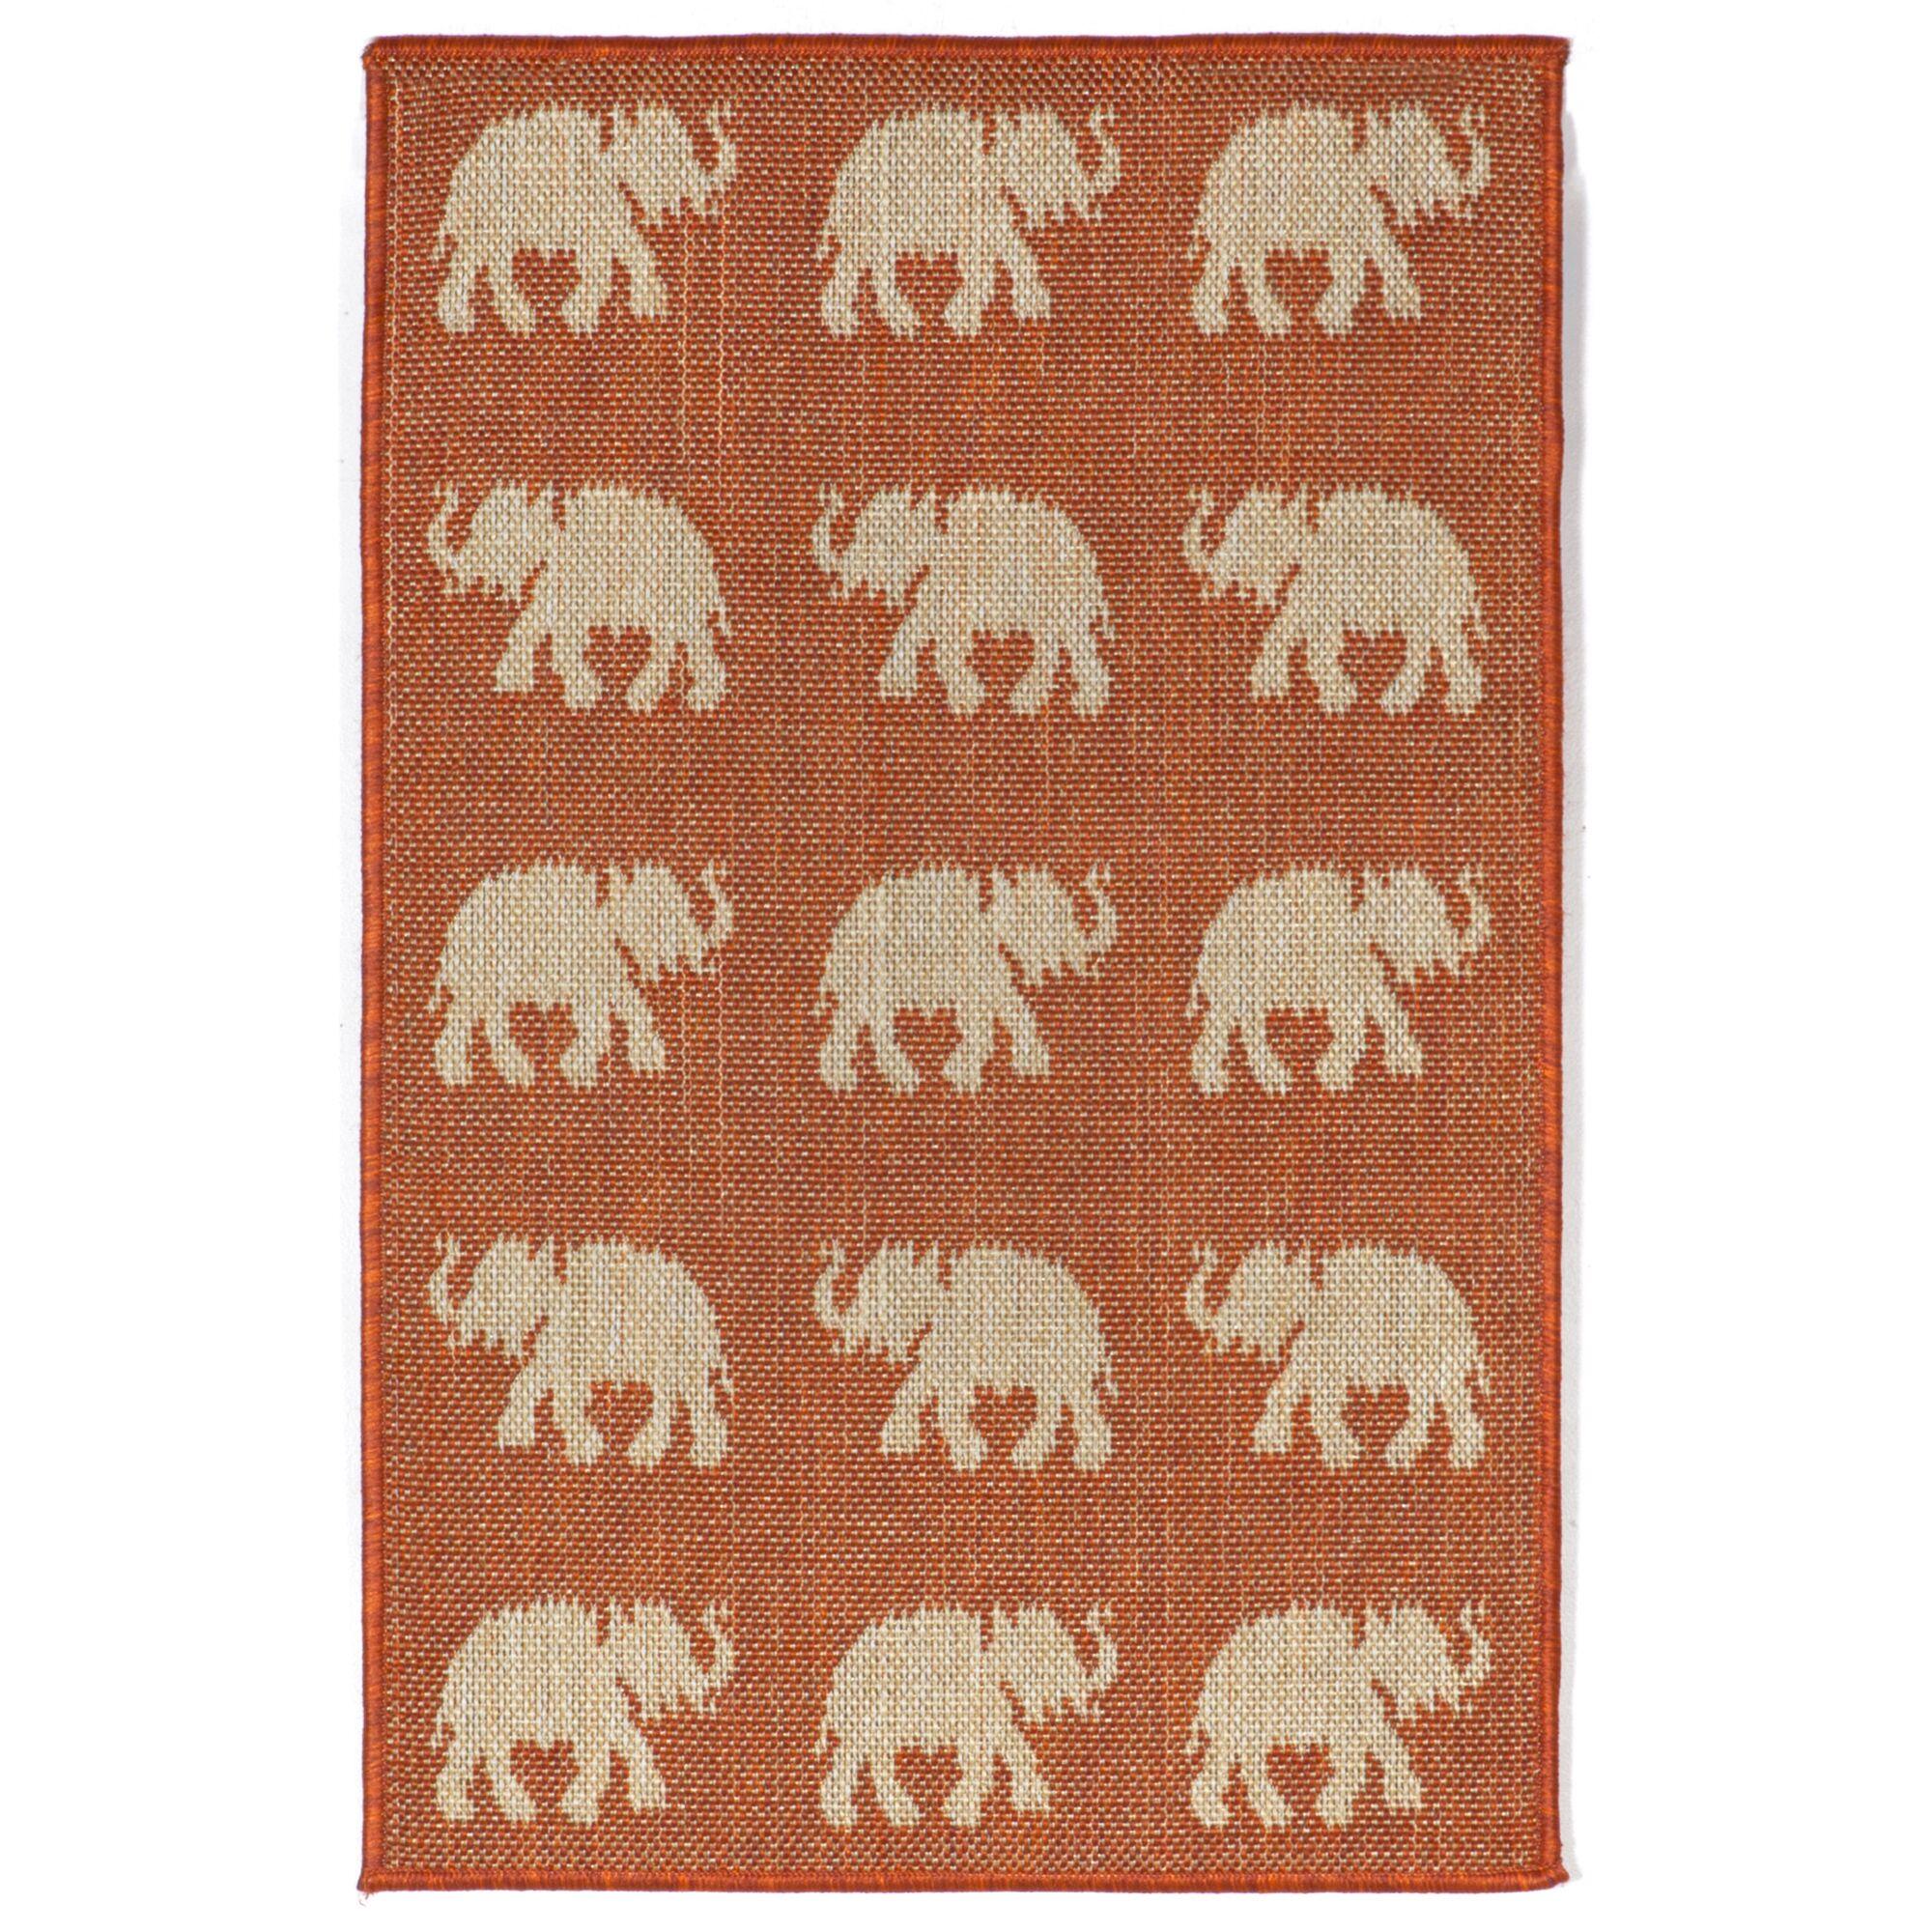 Slimane Elephants Indoor/Outdoor Rug Rug Size: Rectangle 7'10